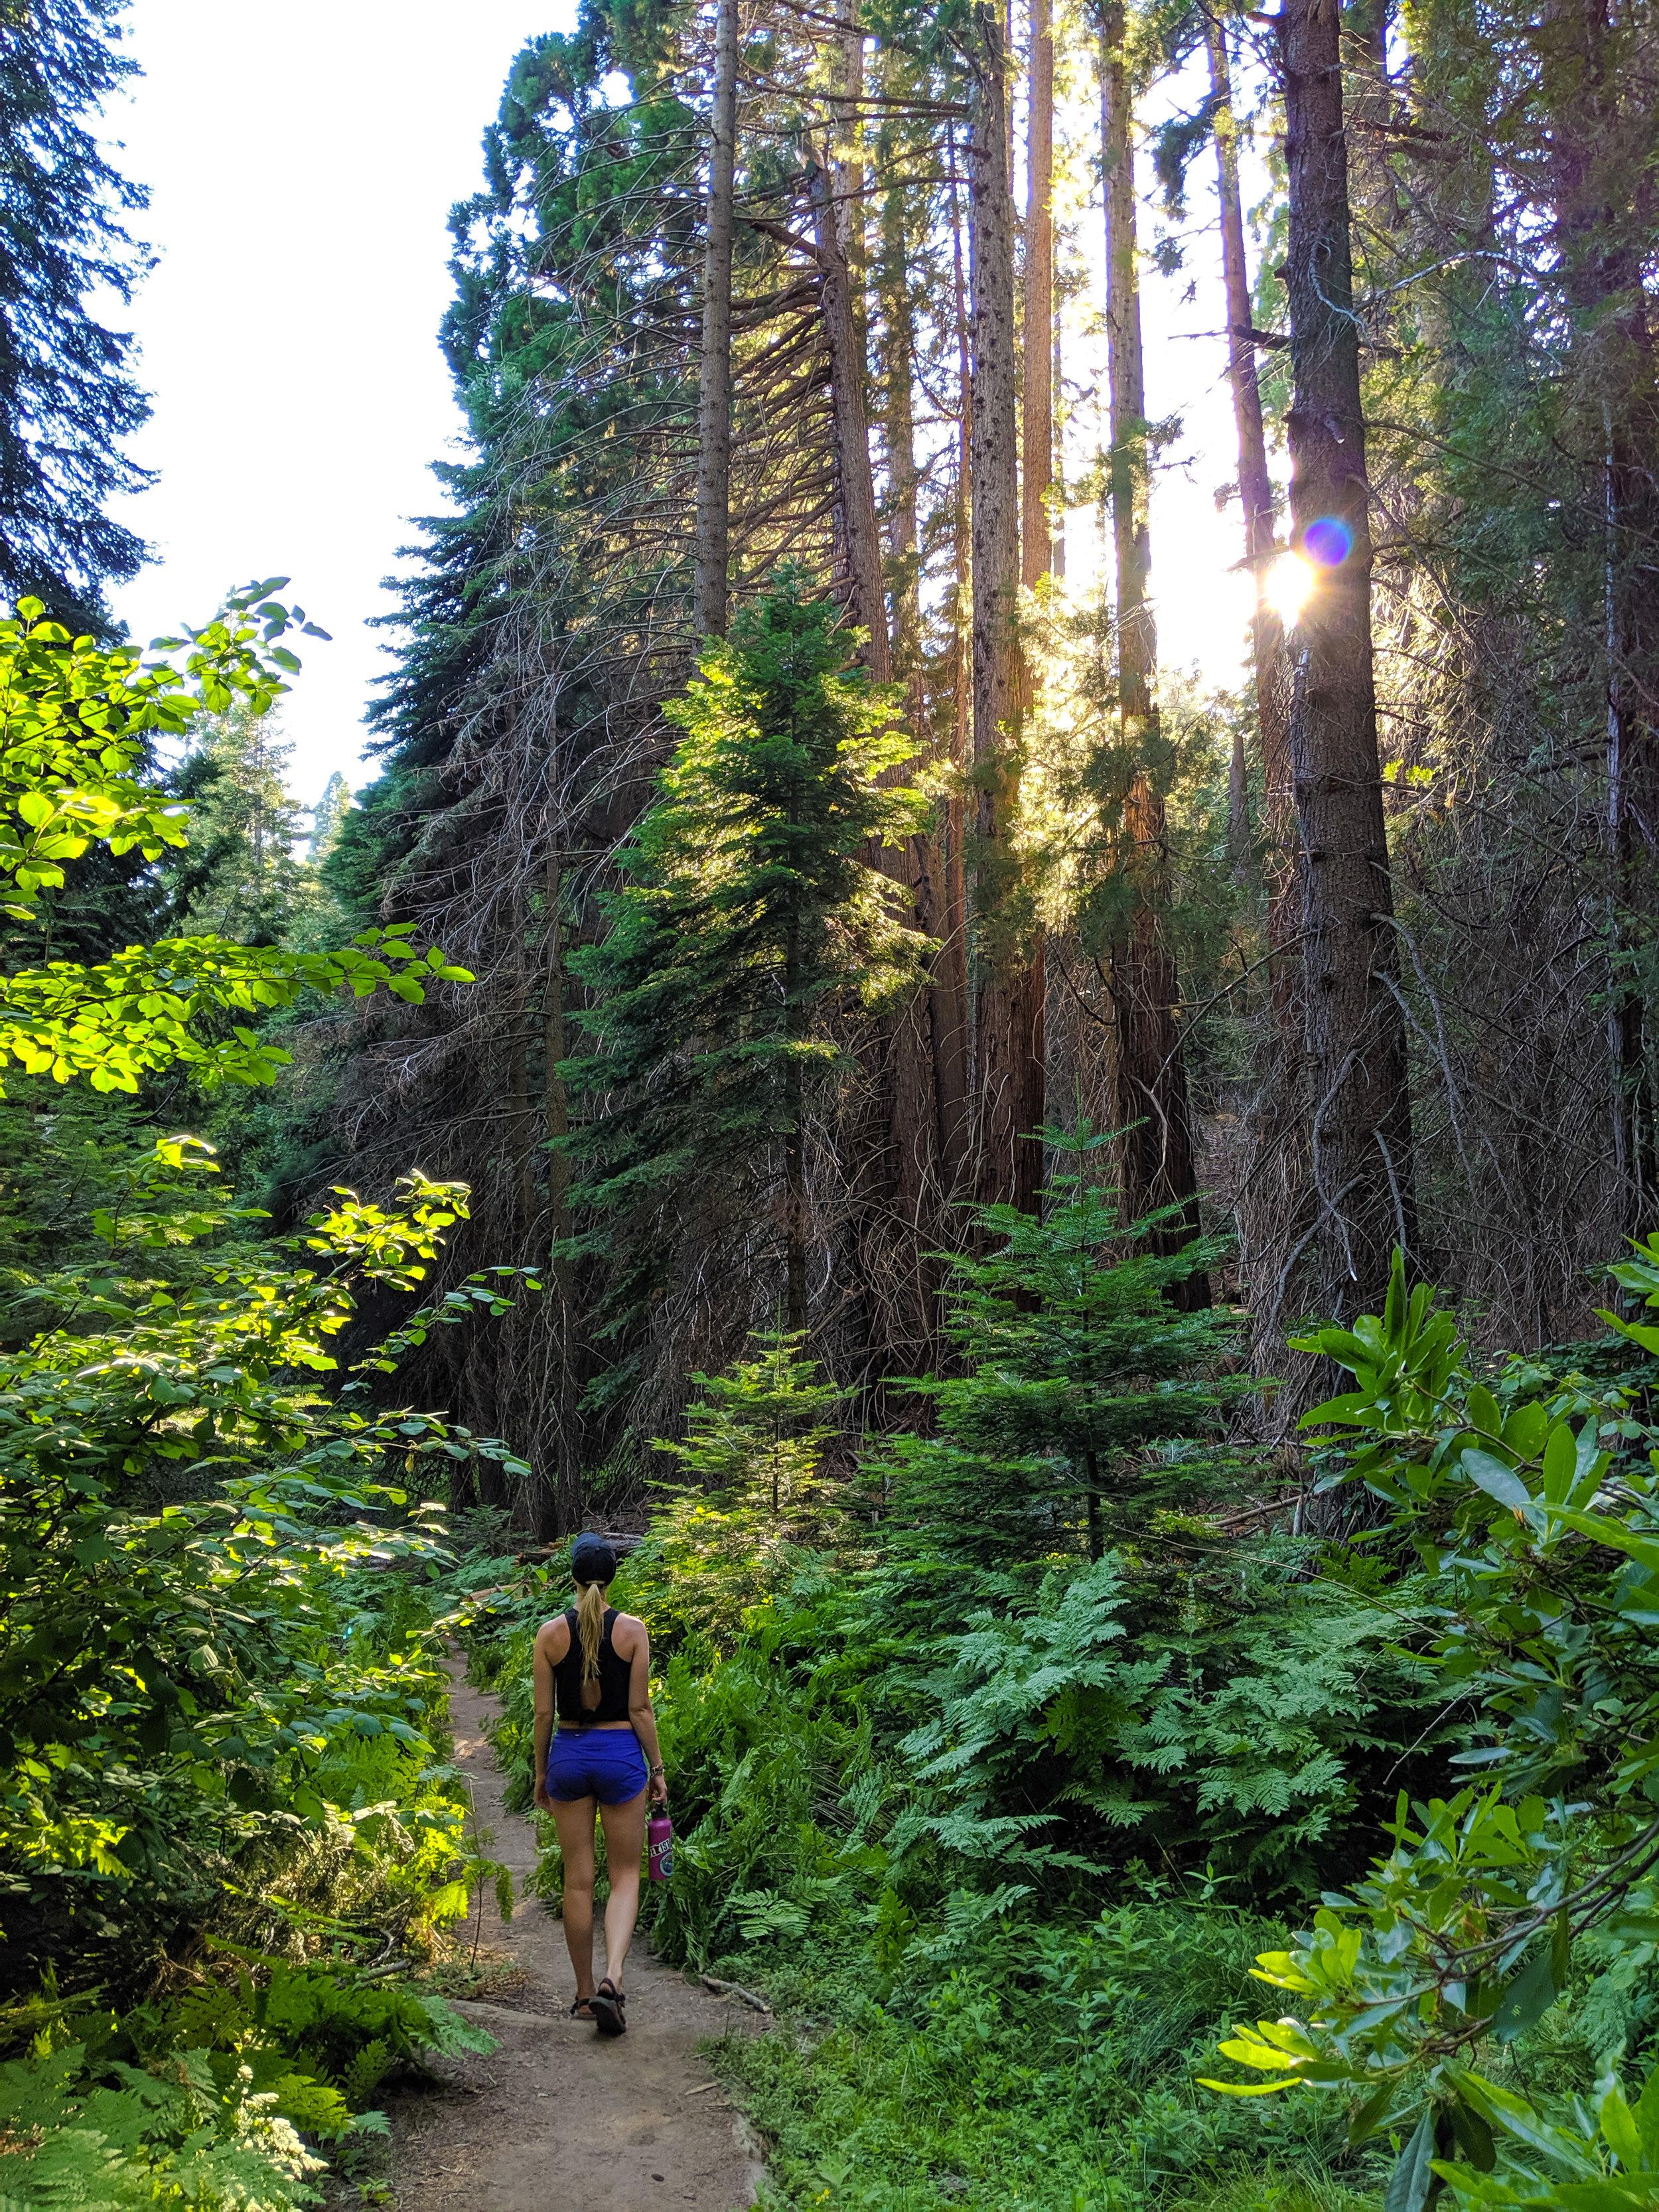 Big Stump Trail, Kings Canyon, Kings Canyon National Park, CA National Parks